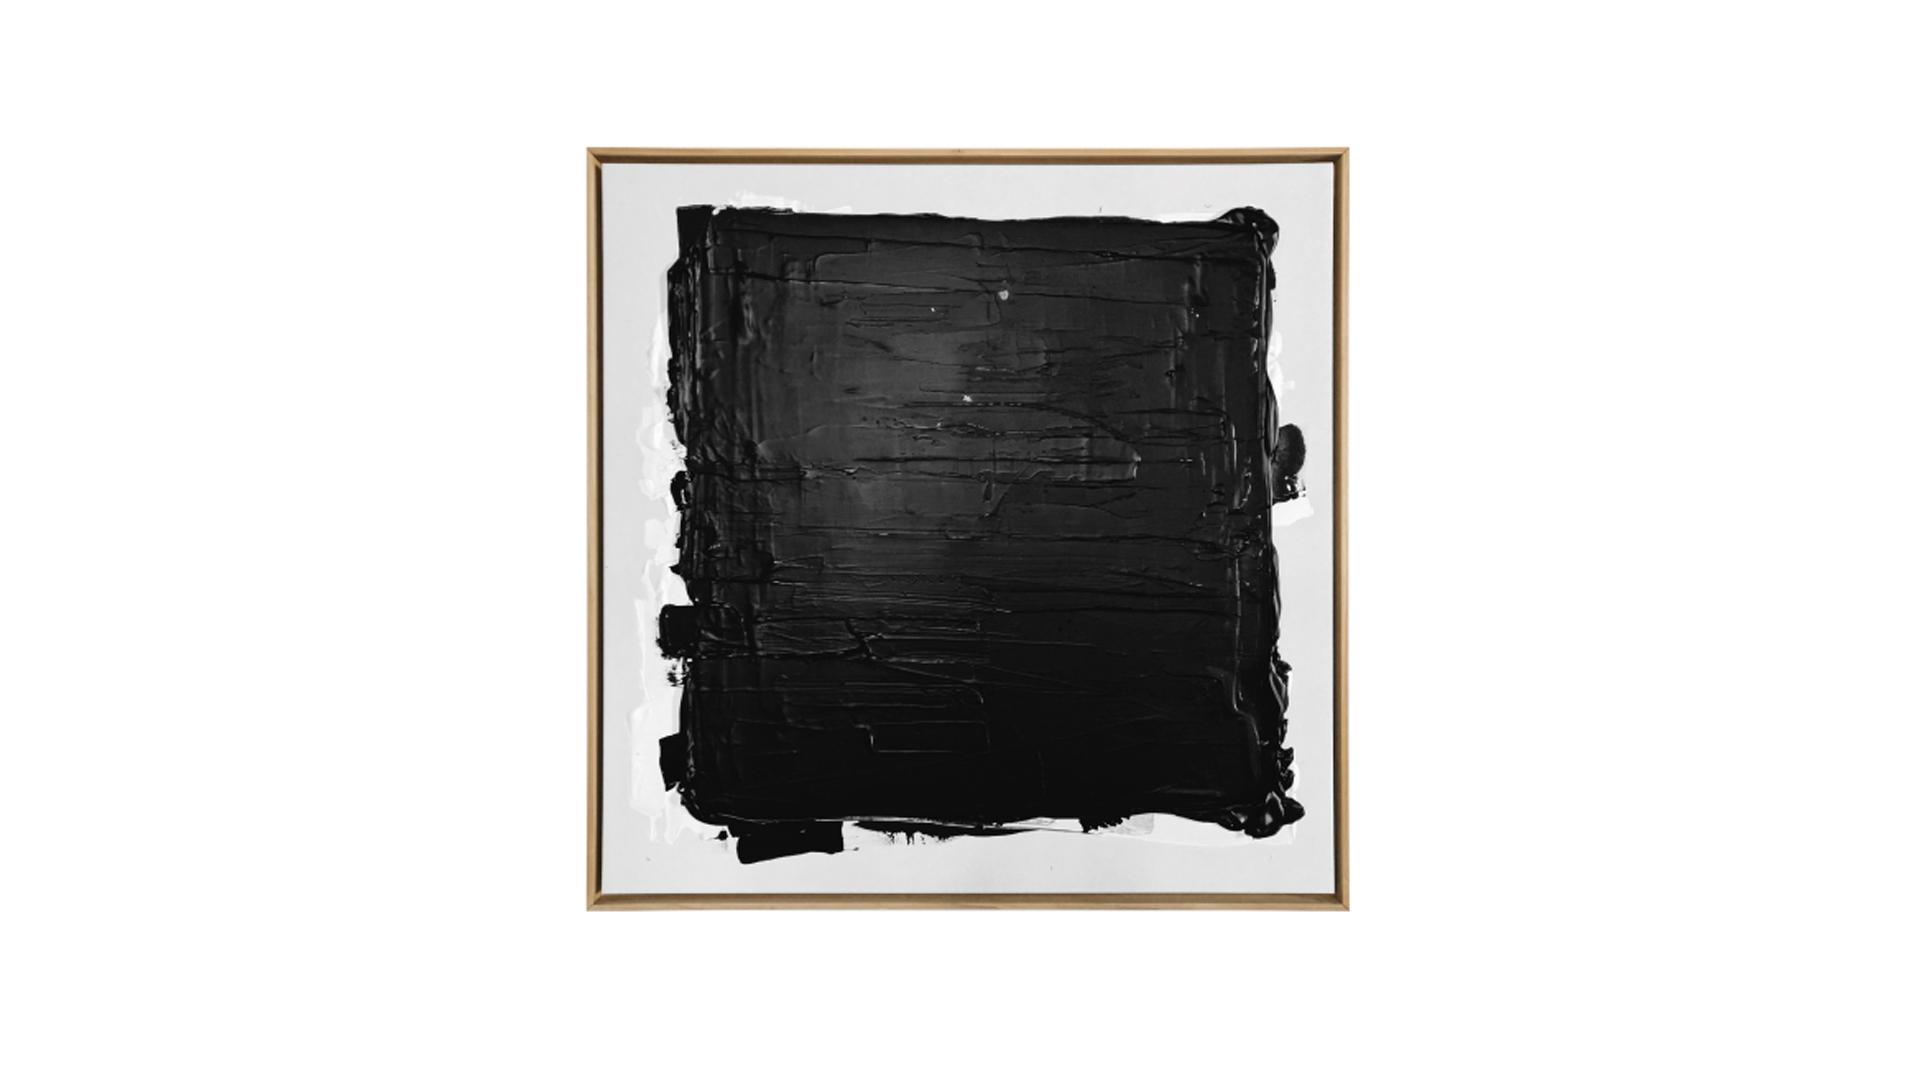 10-ENCONTREMONOS-AARON-NACHTAILER-ART-ARTIST-VERTICAL